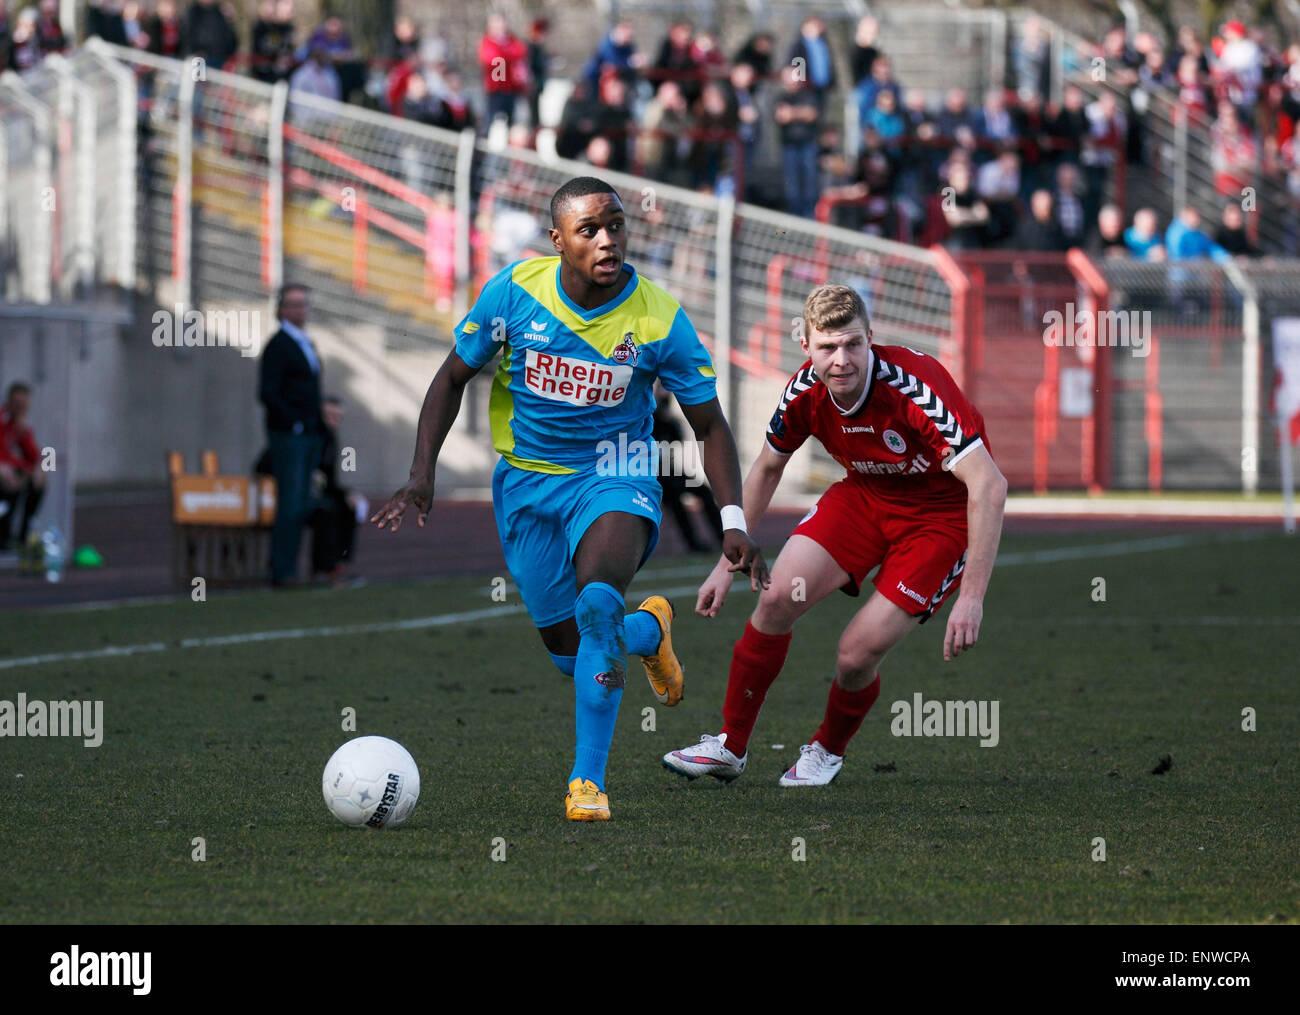 sports, football, Regional League West, 2014/2015, Rot Weiss Oberhausen versus 1. FC Cologne 2:0, Stadium Niederrhein - Stock Image